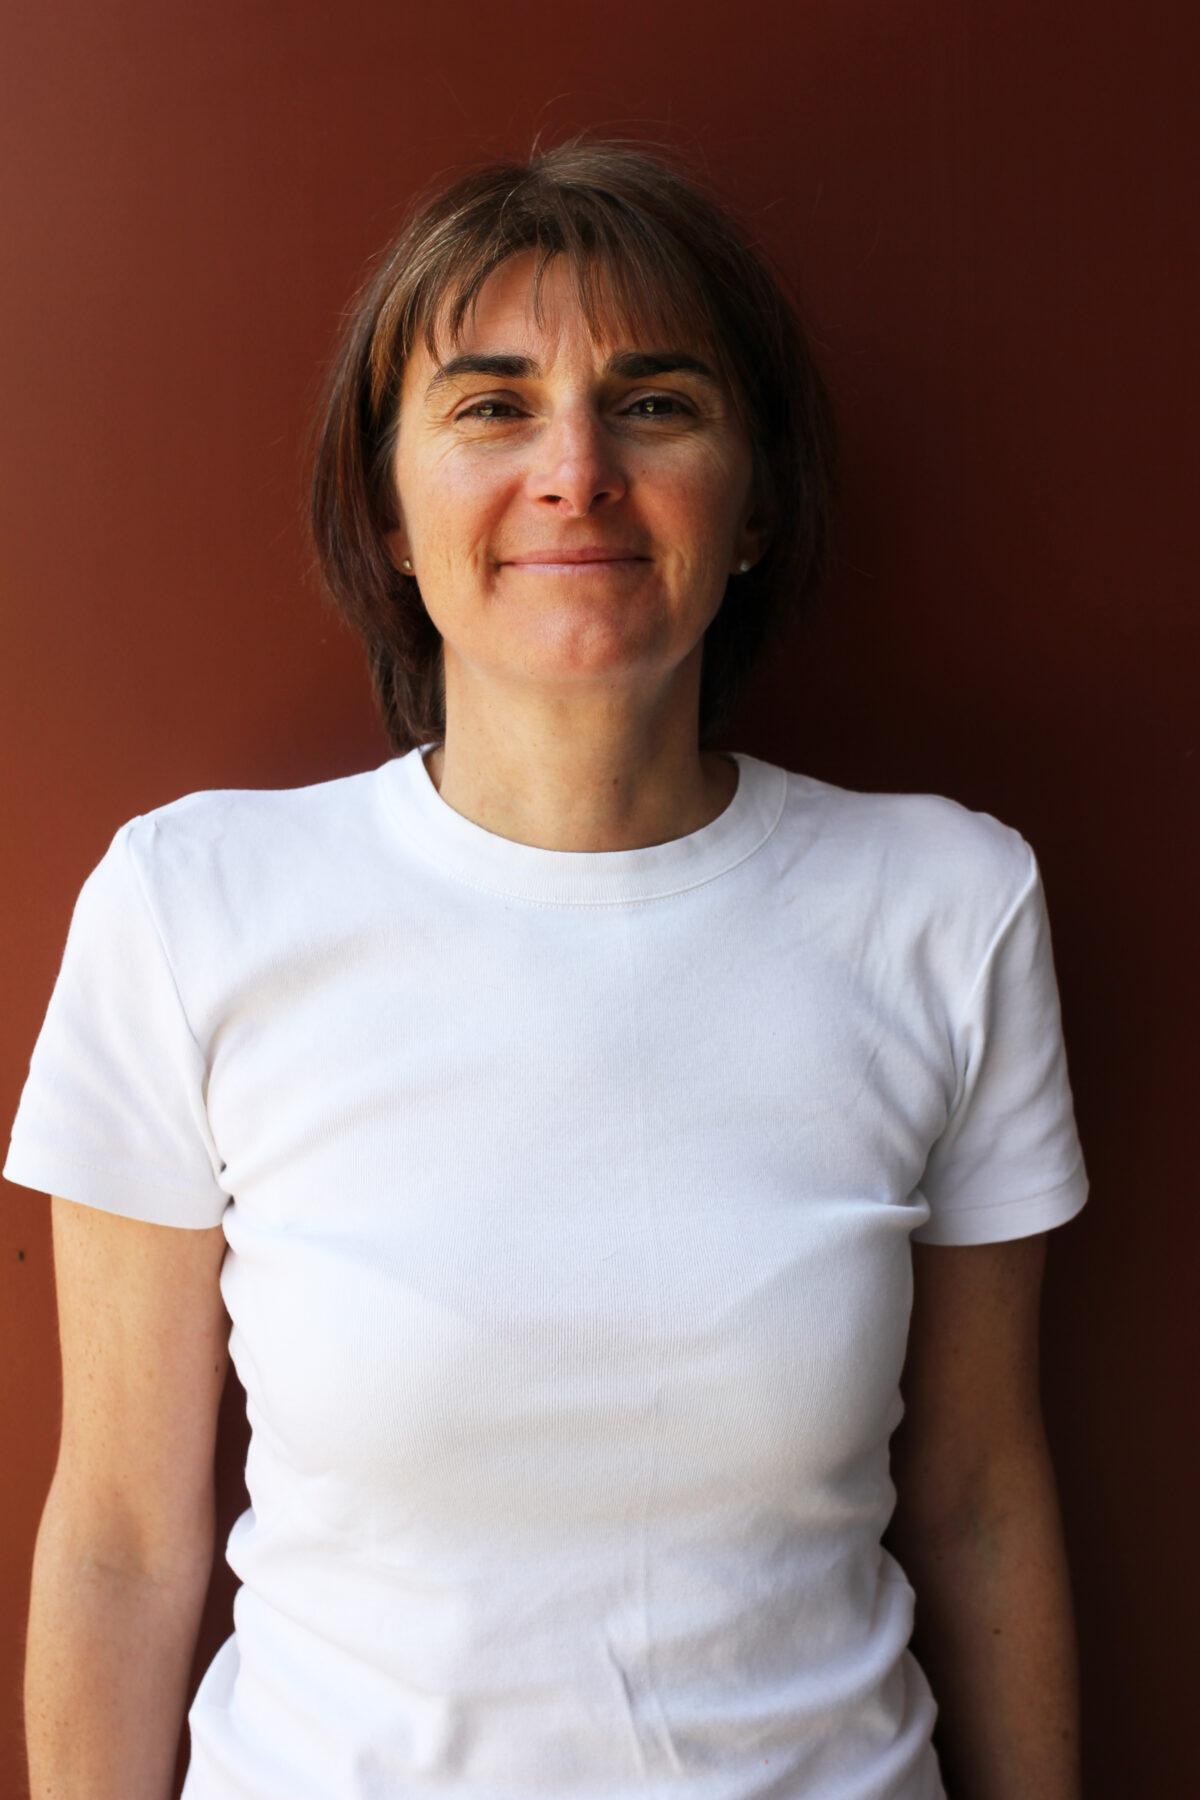 Cécile PIGNOL